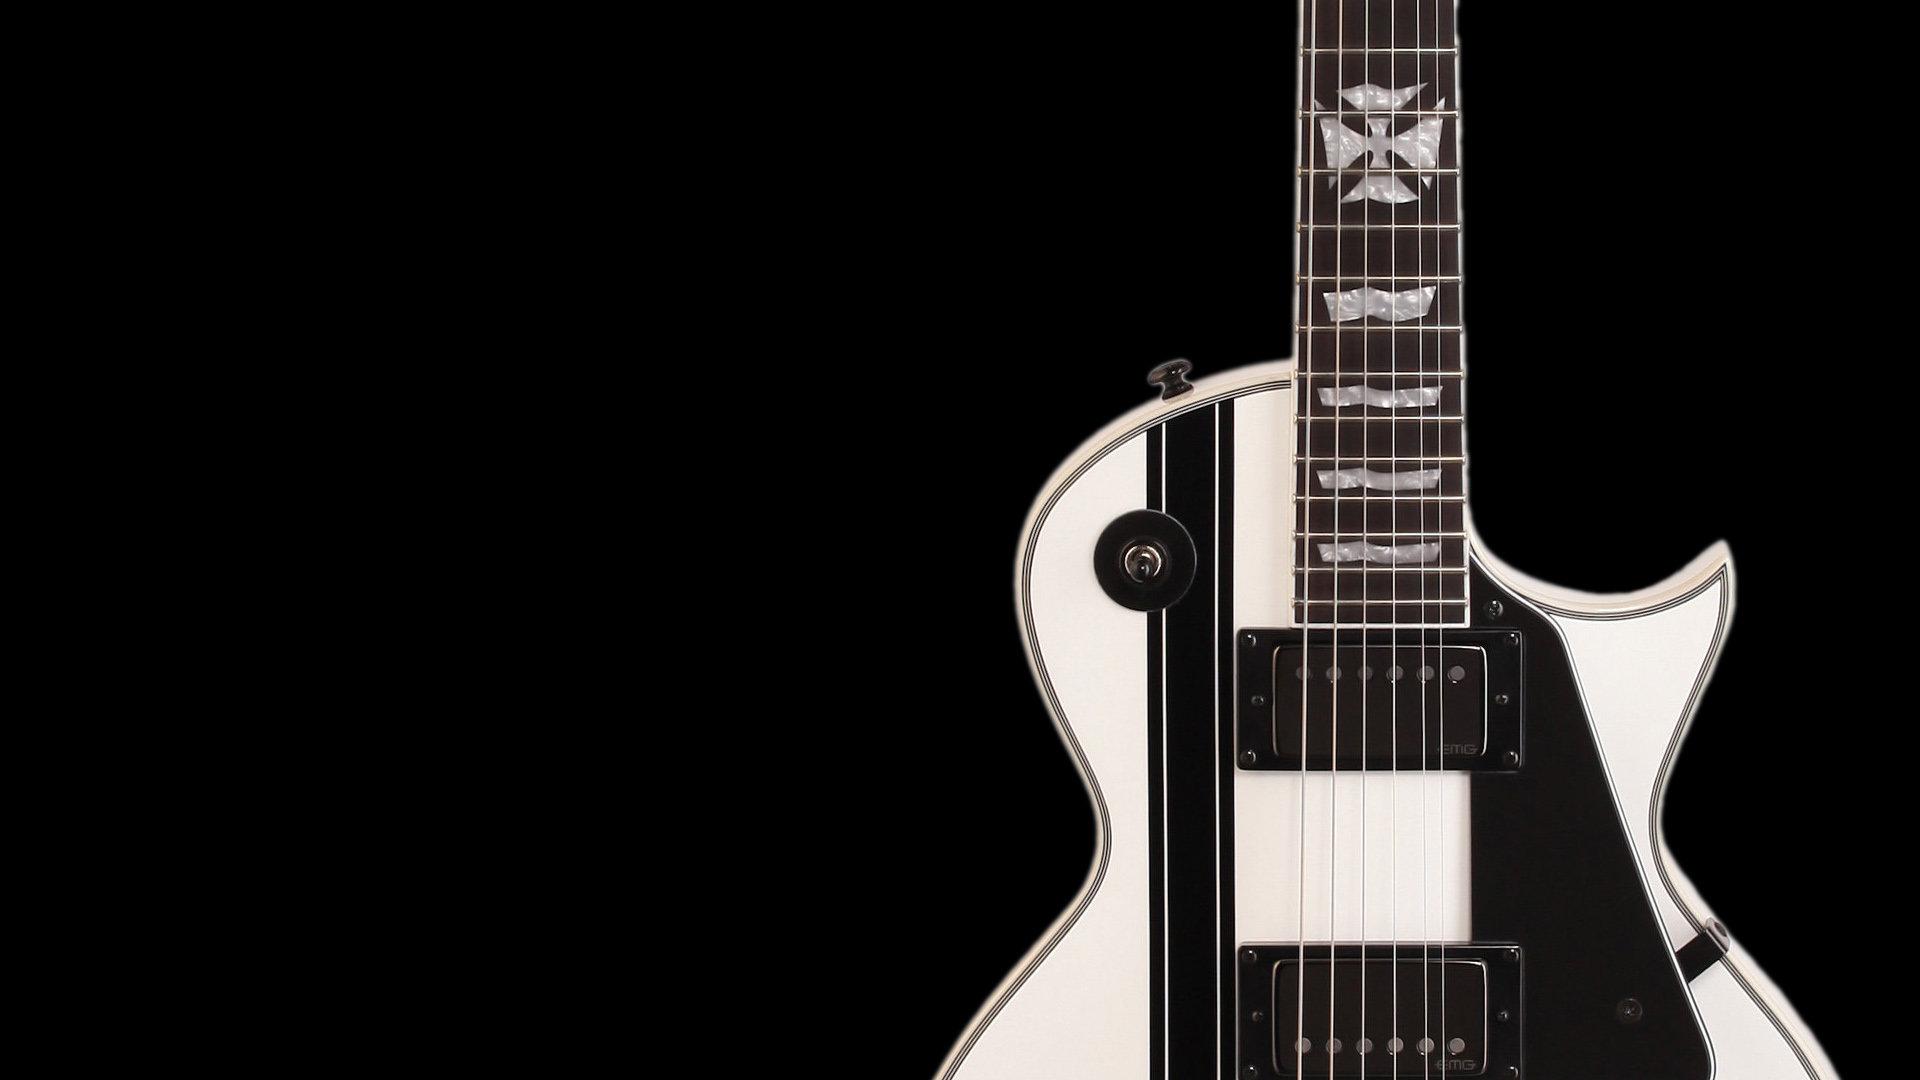 white guitar wallpaper 66468